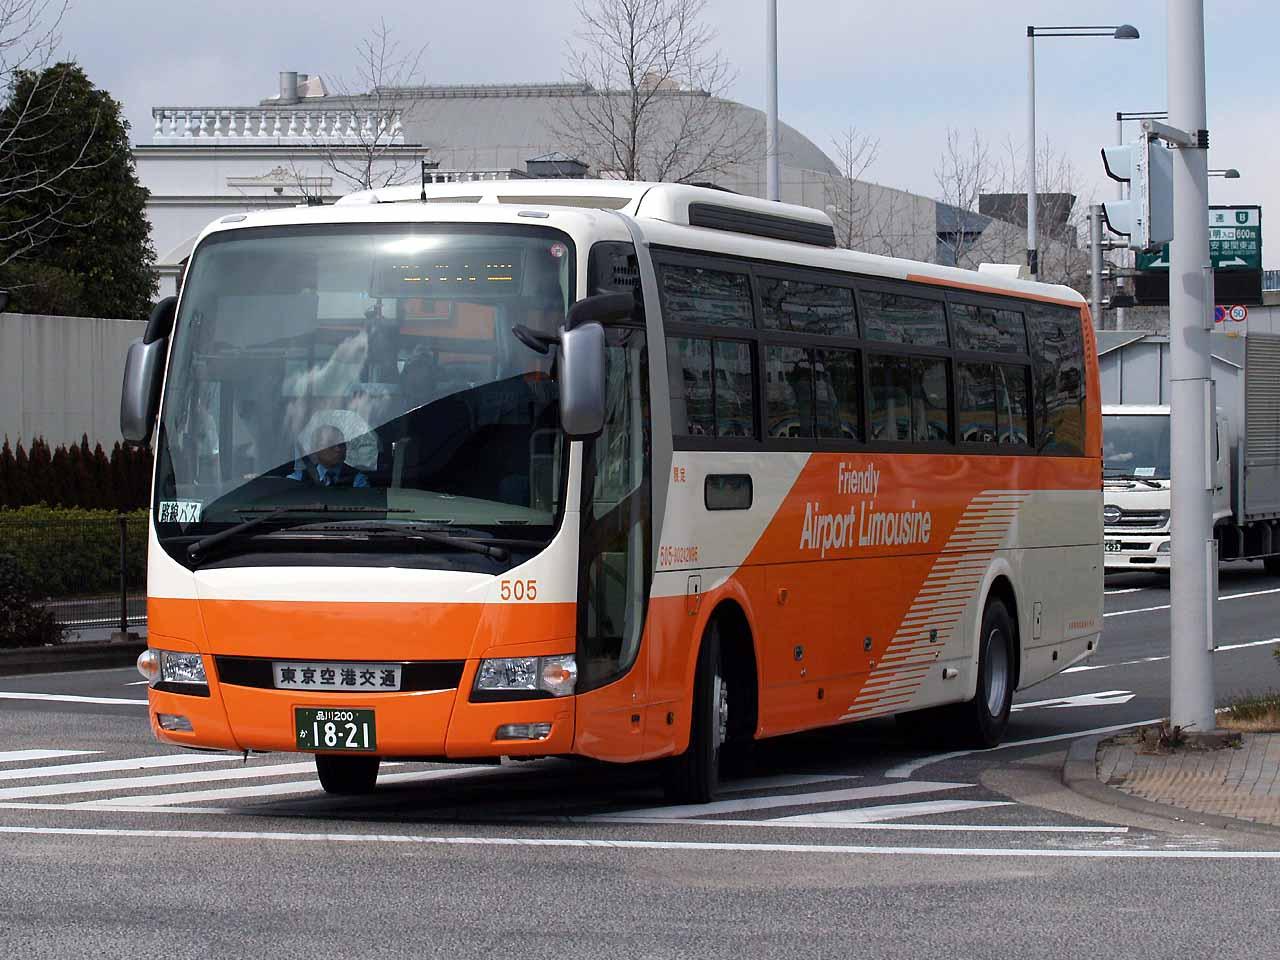 【LIMOUSINE巴士】機場直達新宿/池袋 │包pocket wifi租借服務│東京自由行套票3-31天